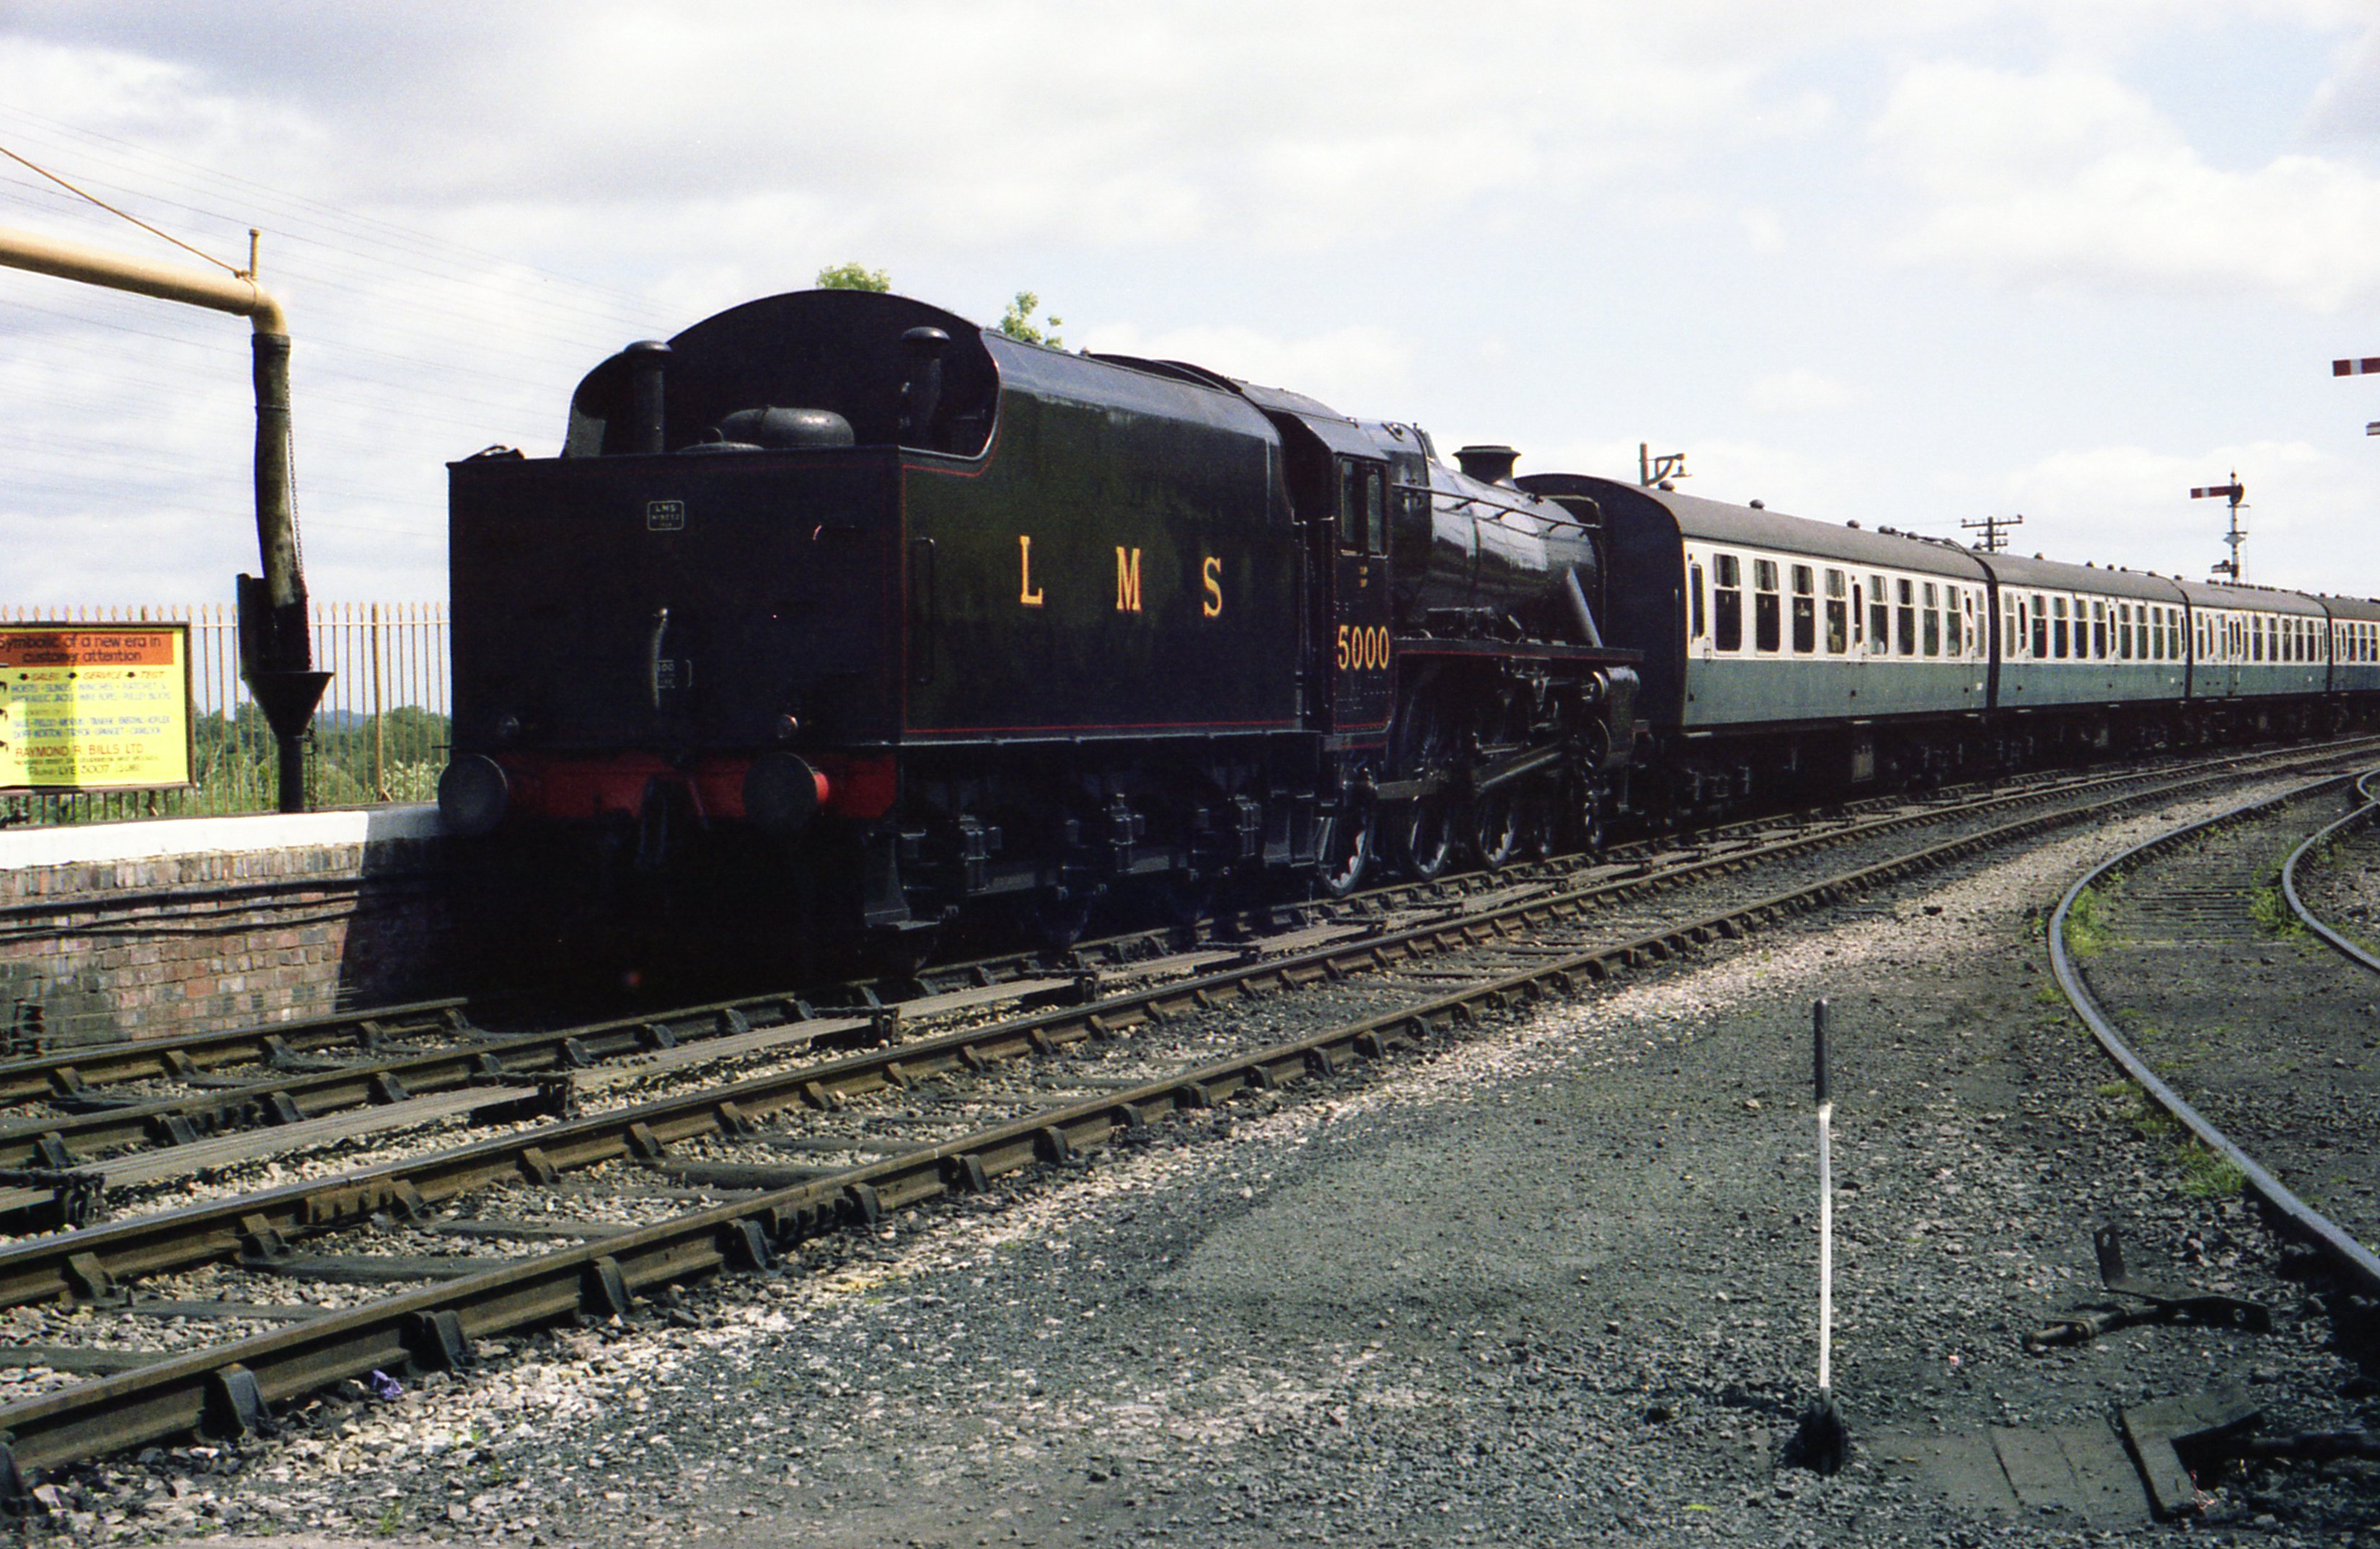 File:LMS Black 5 No 5000 at Bridgenorth station jpg